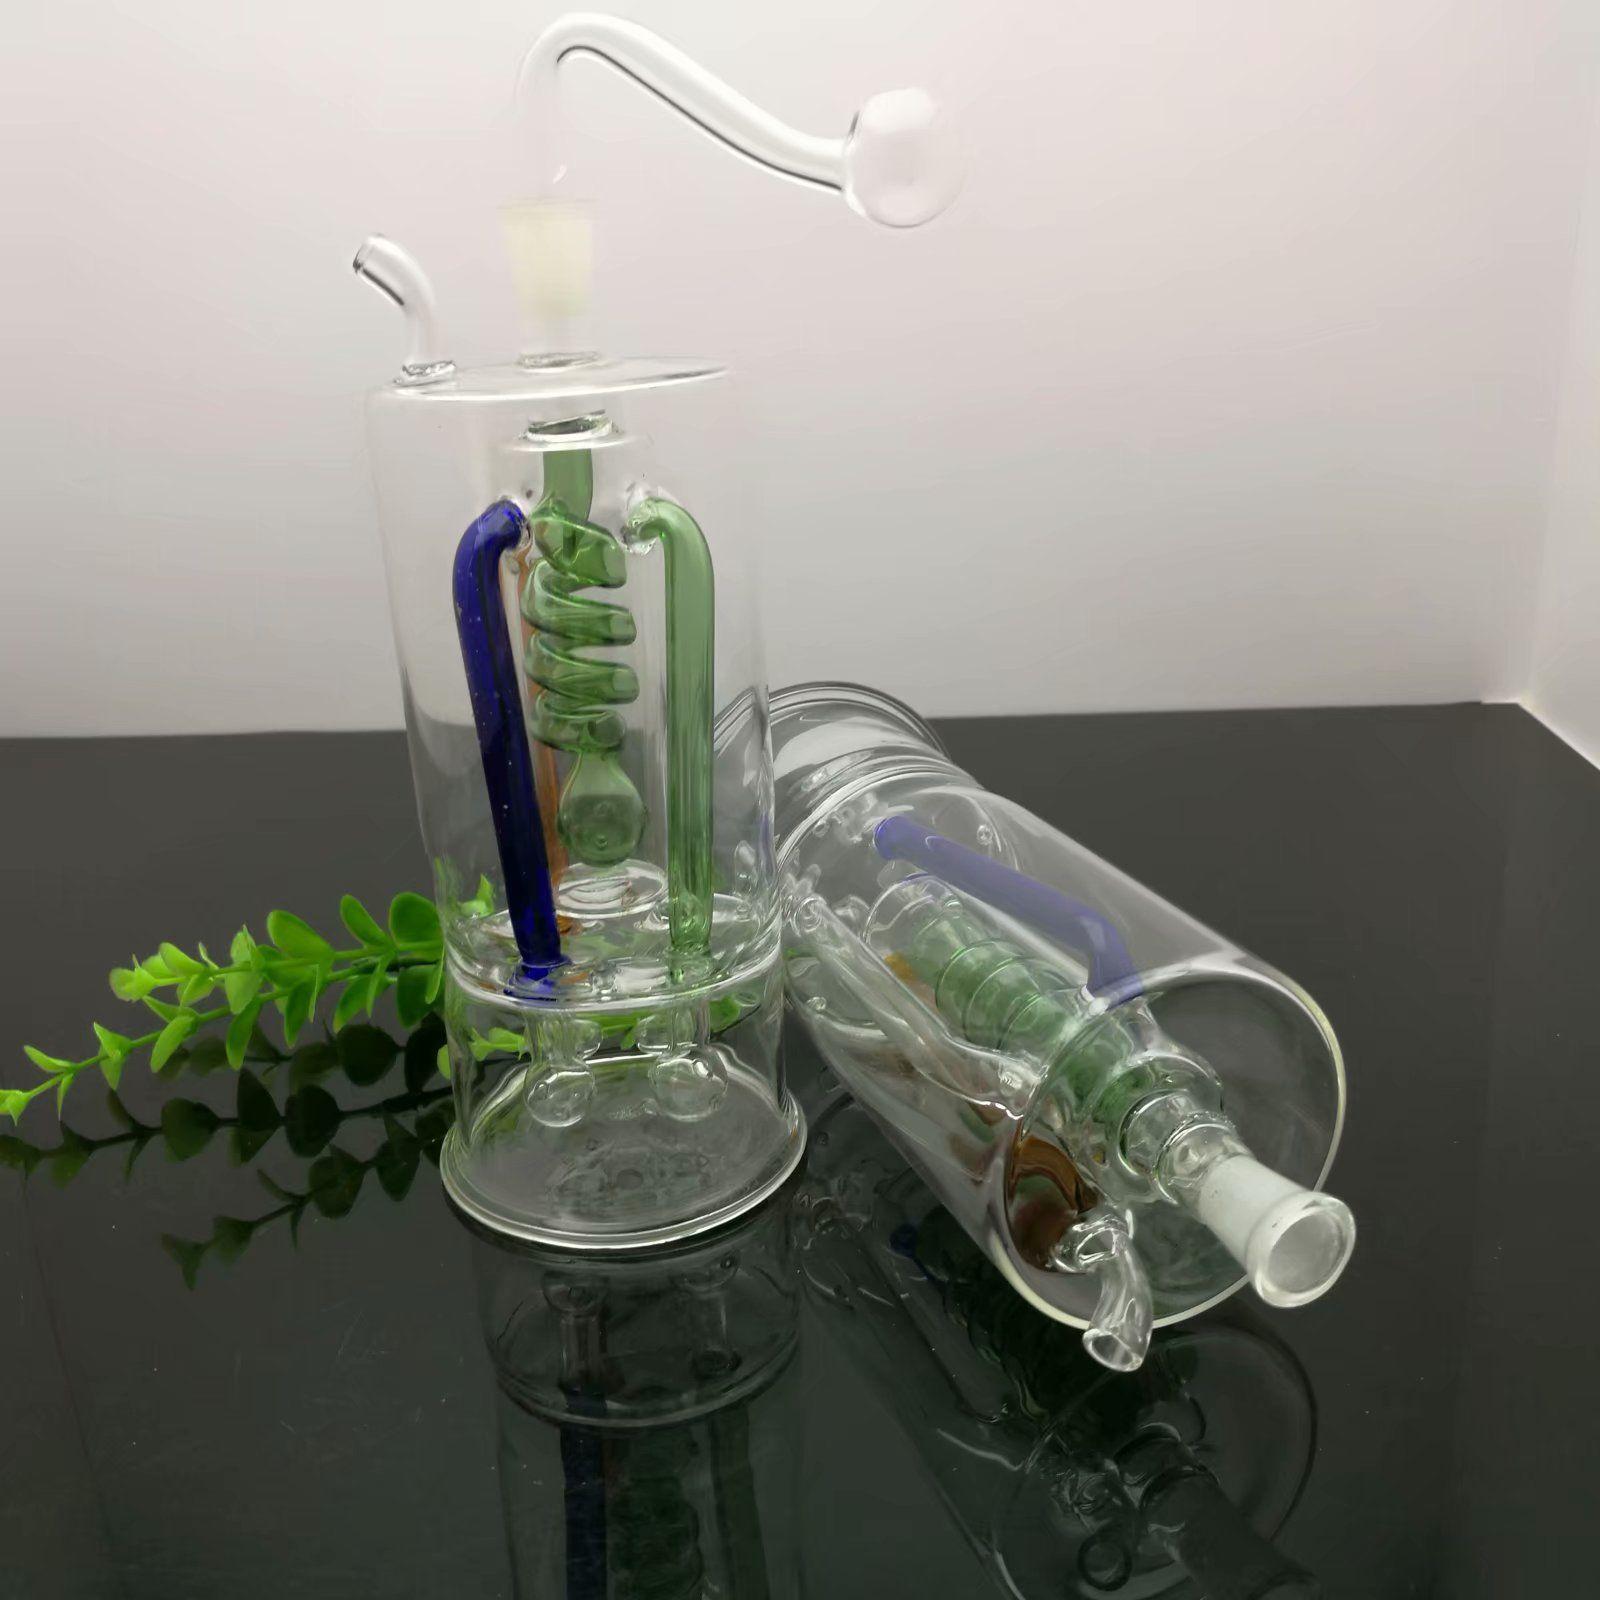 Multi cor garras placa silkplate garrafa de água de vidro bongs mudo vidro grosso Pipes Oil Burner água Vidro plataformas petrolíferas fumadores,